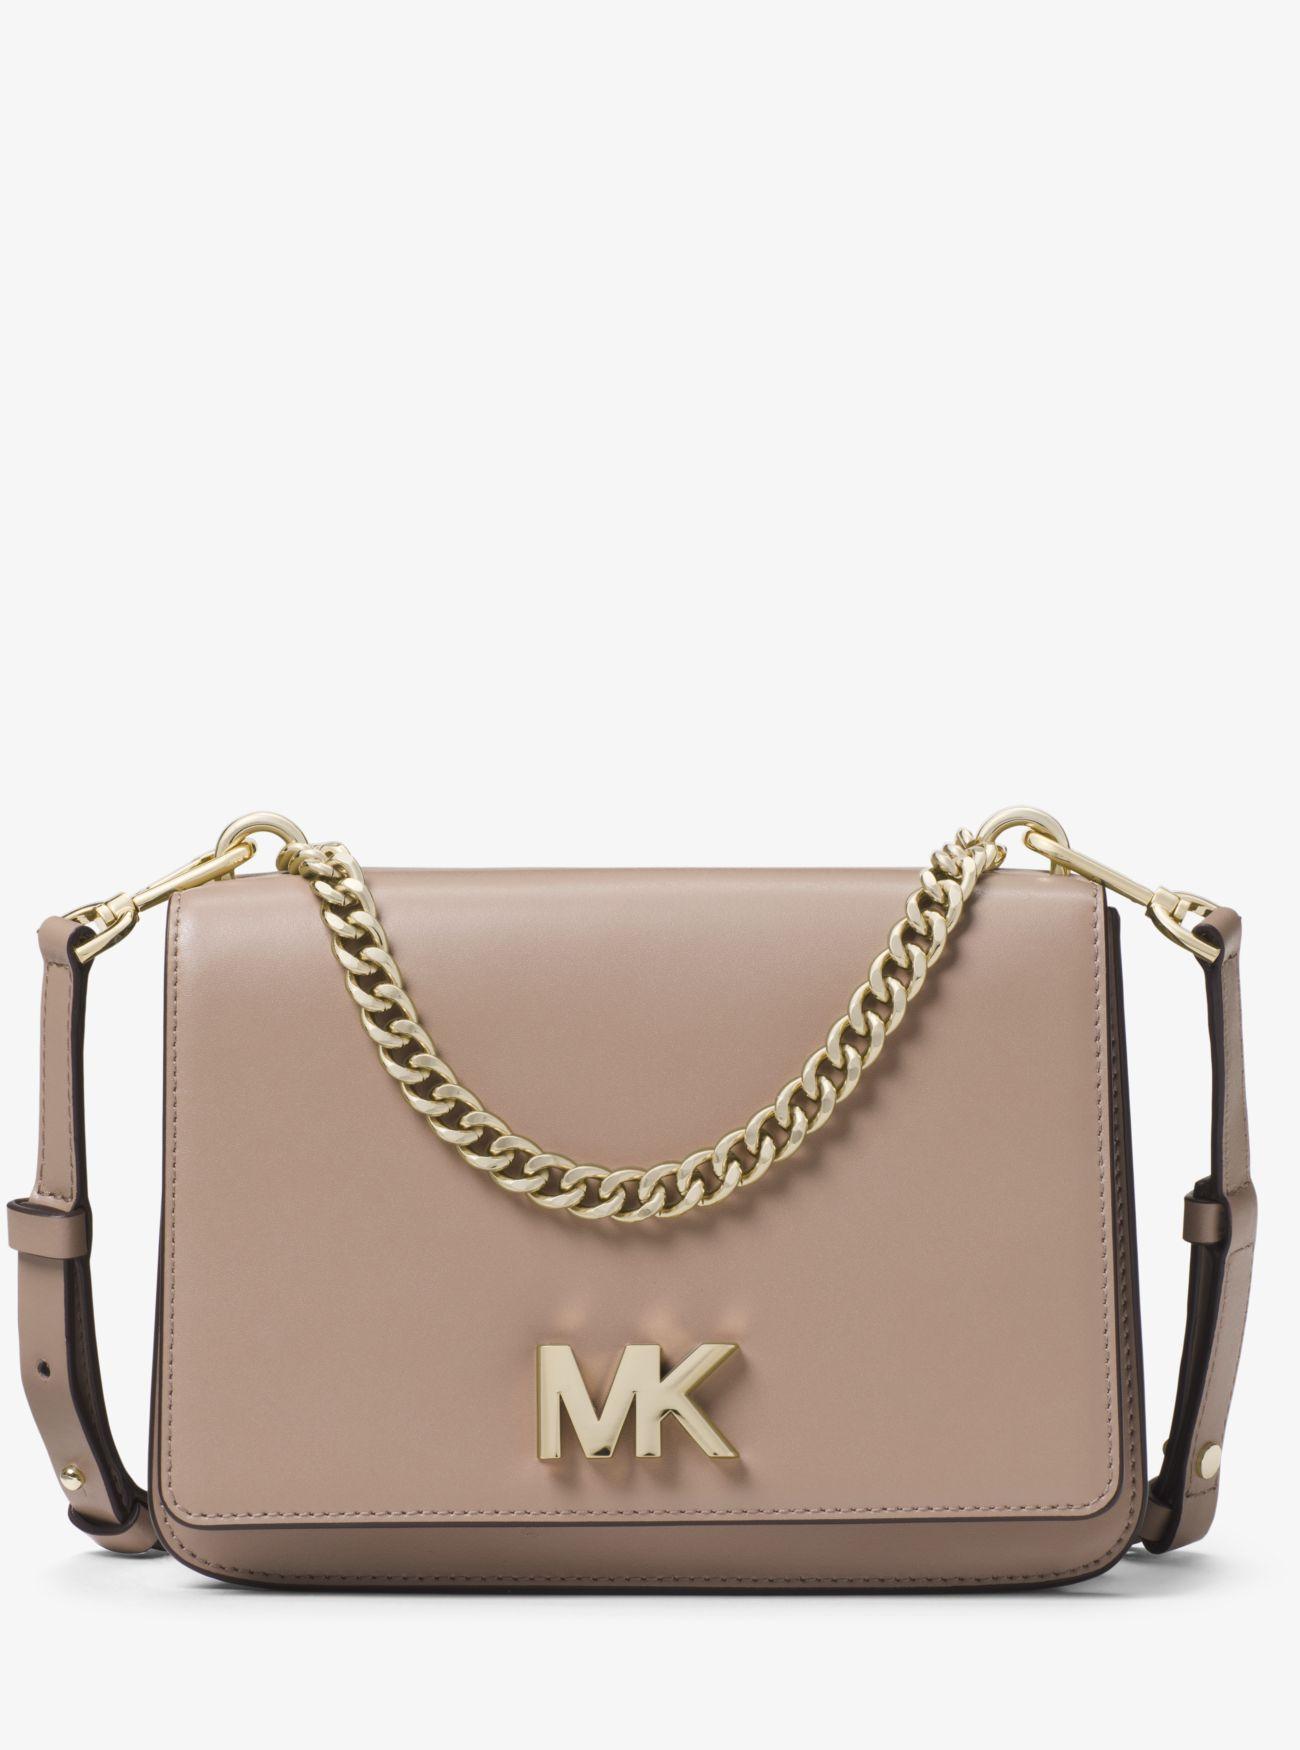 f34f8cee87b1 Michael Kors. Women s Mott Large Leather Crossbody Bag